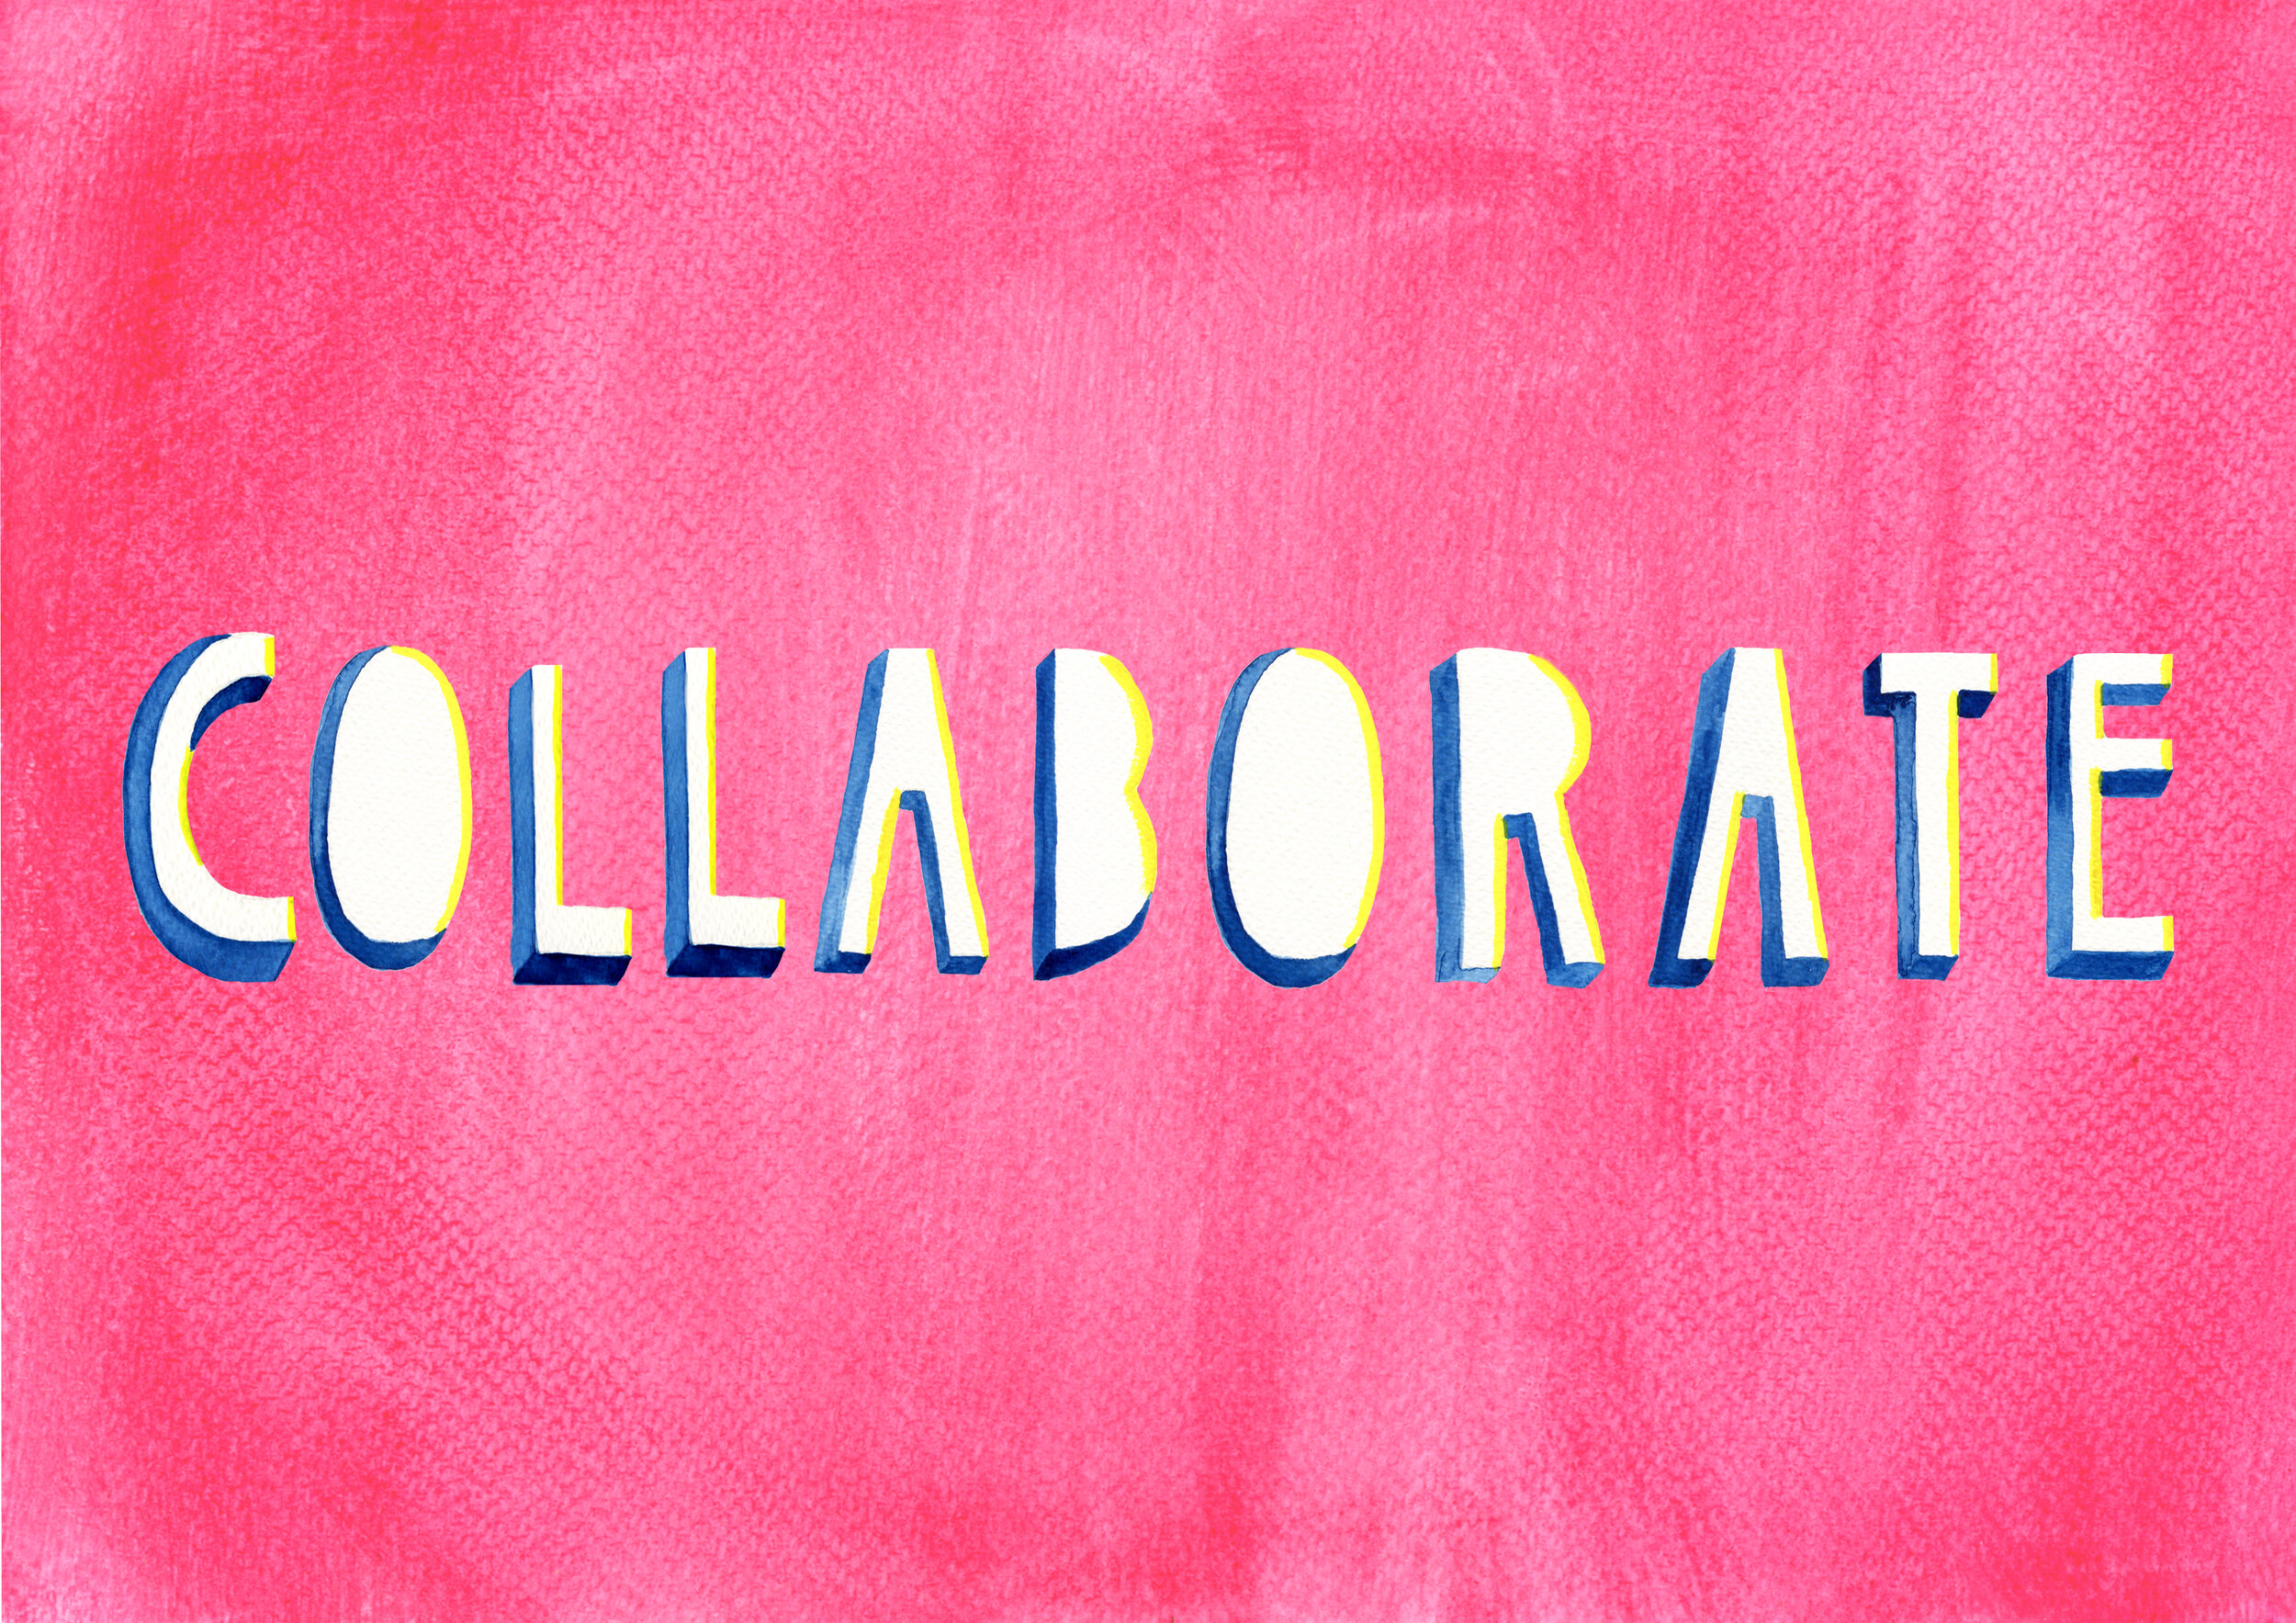 COLLABORATE2 (1).jpg